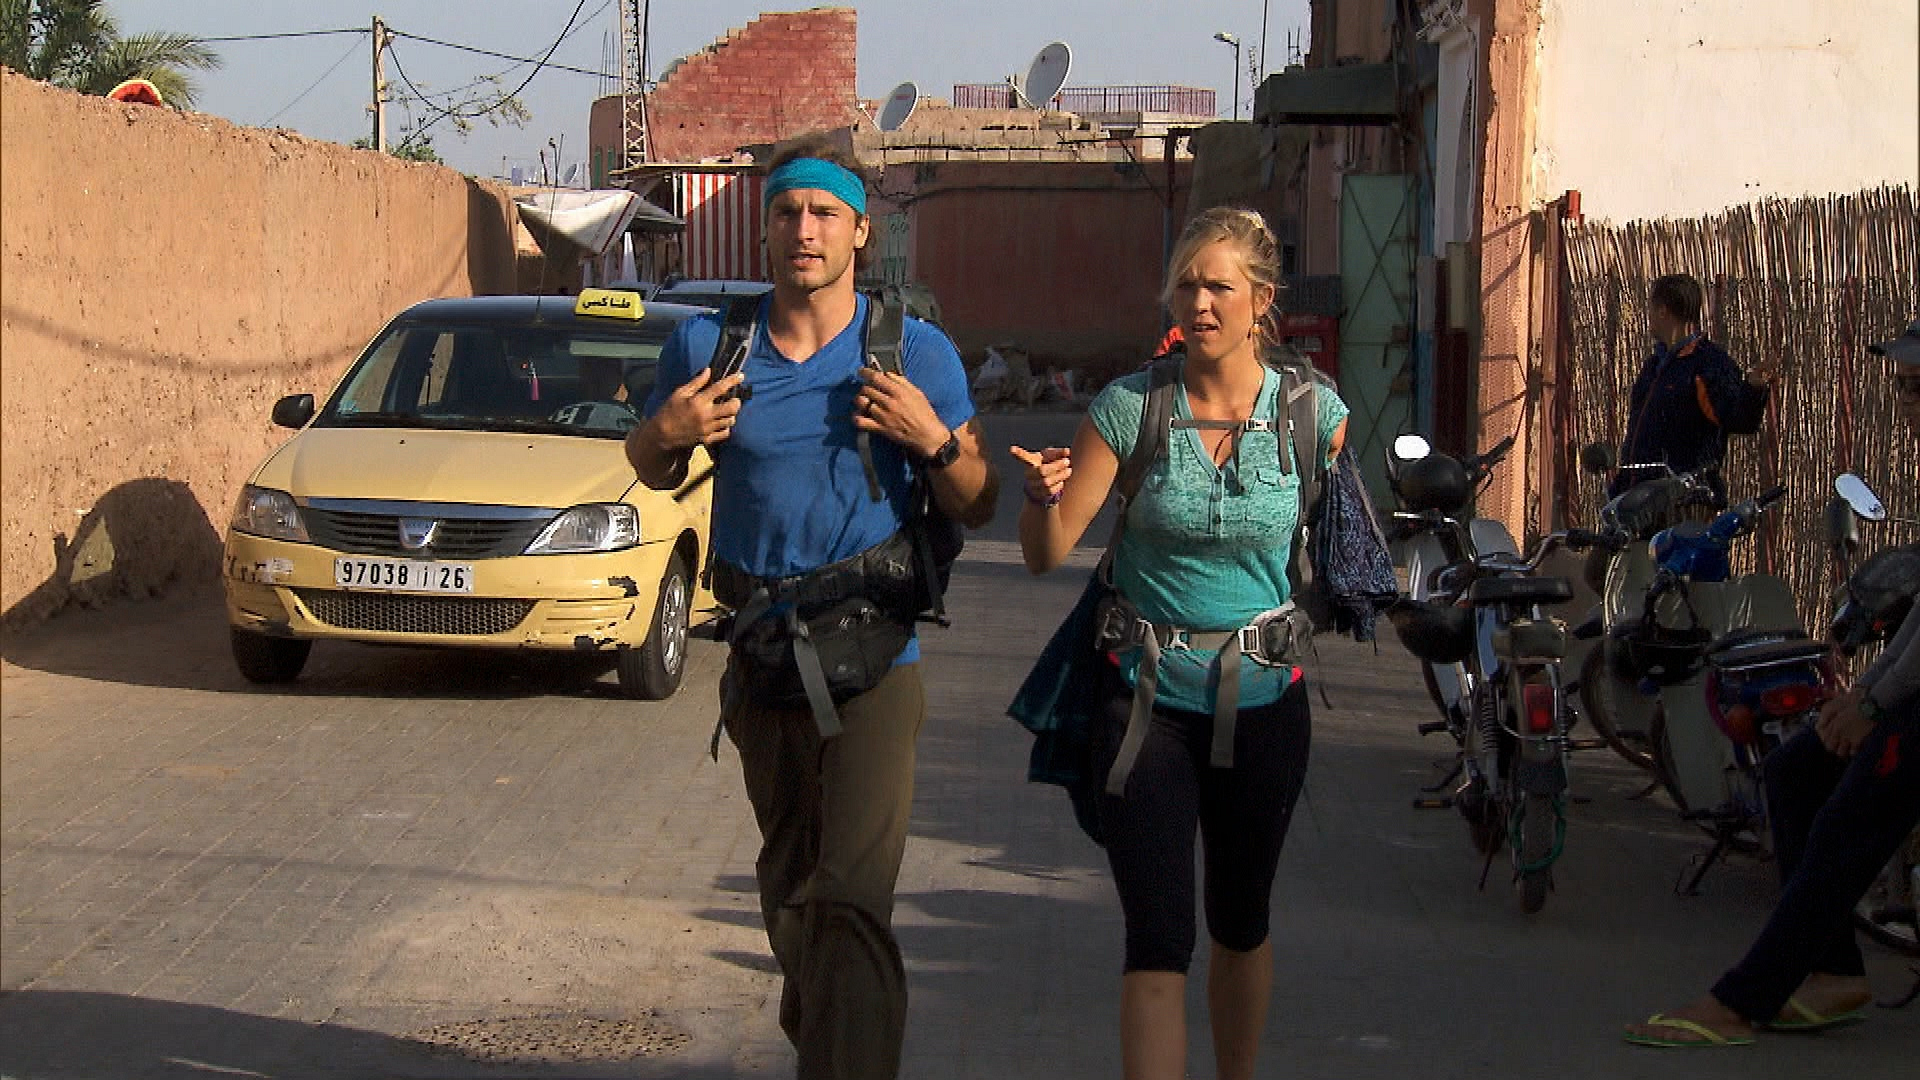 Traveling through Morocco